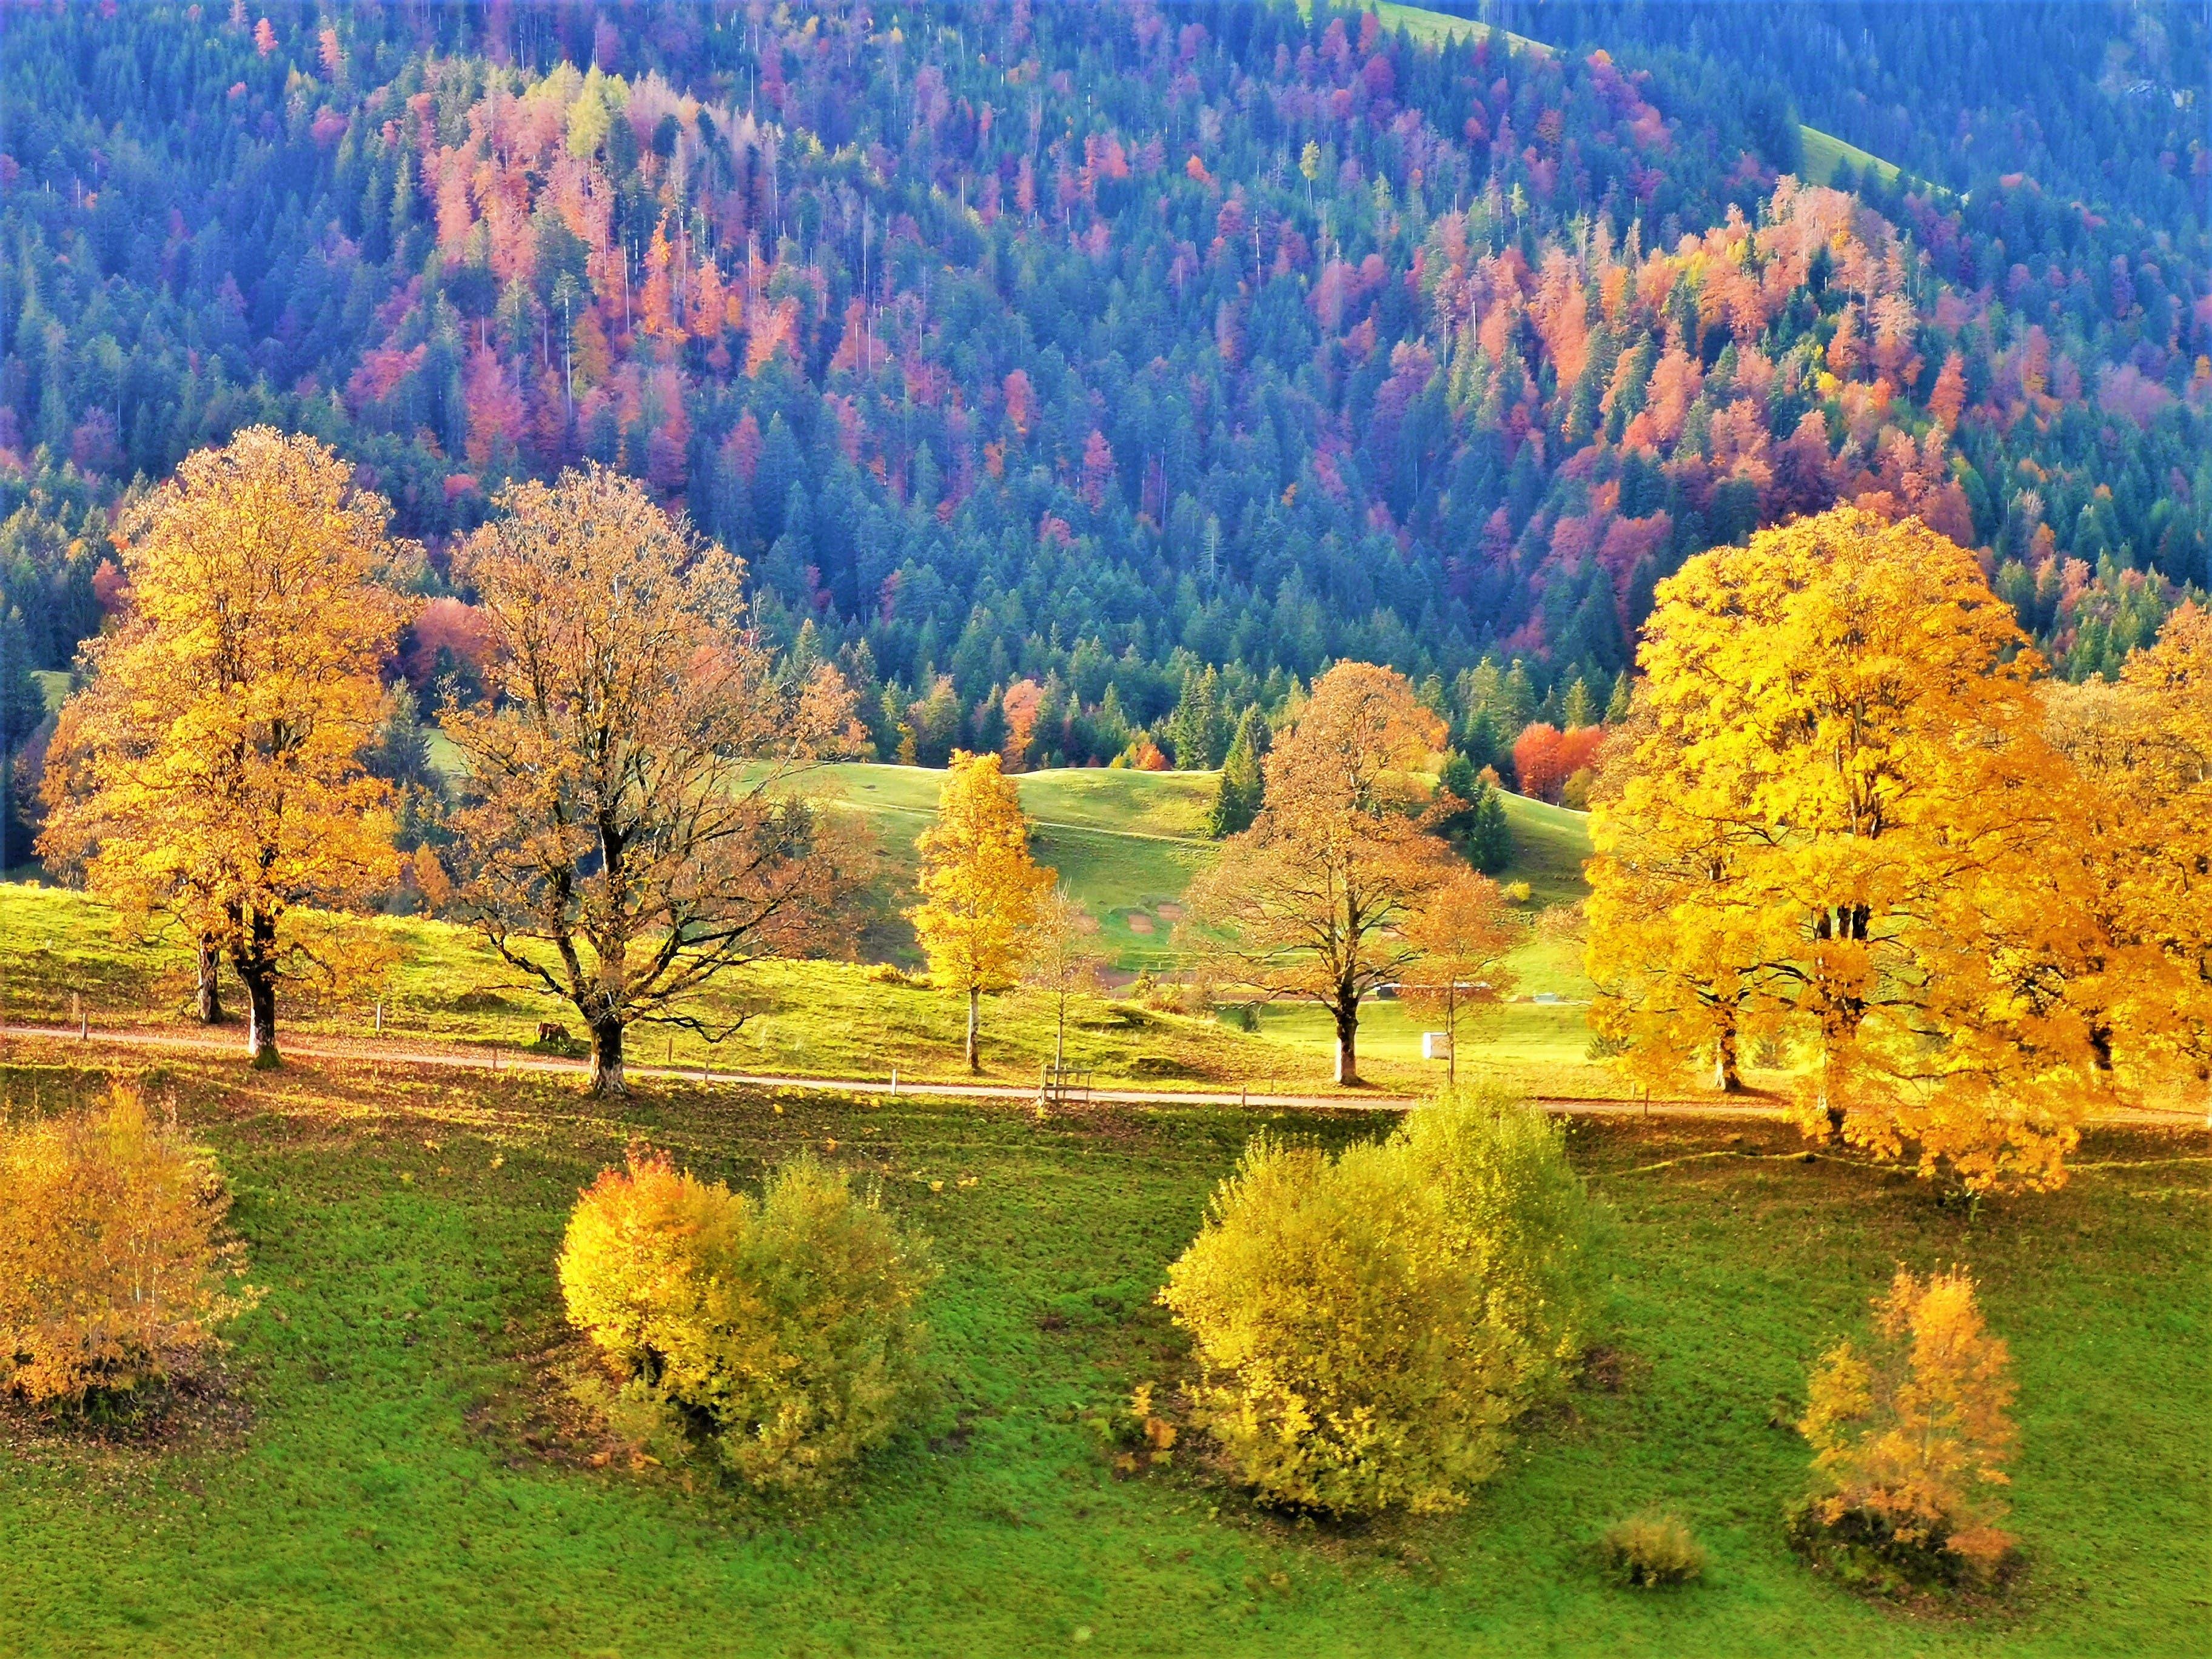 Goldener Herbst bei sonnigem Herbstwetter.